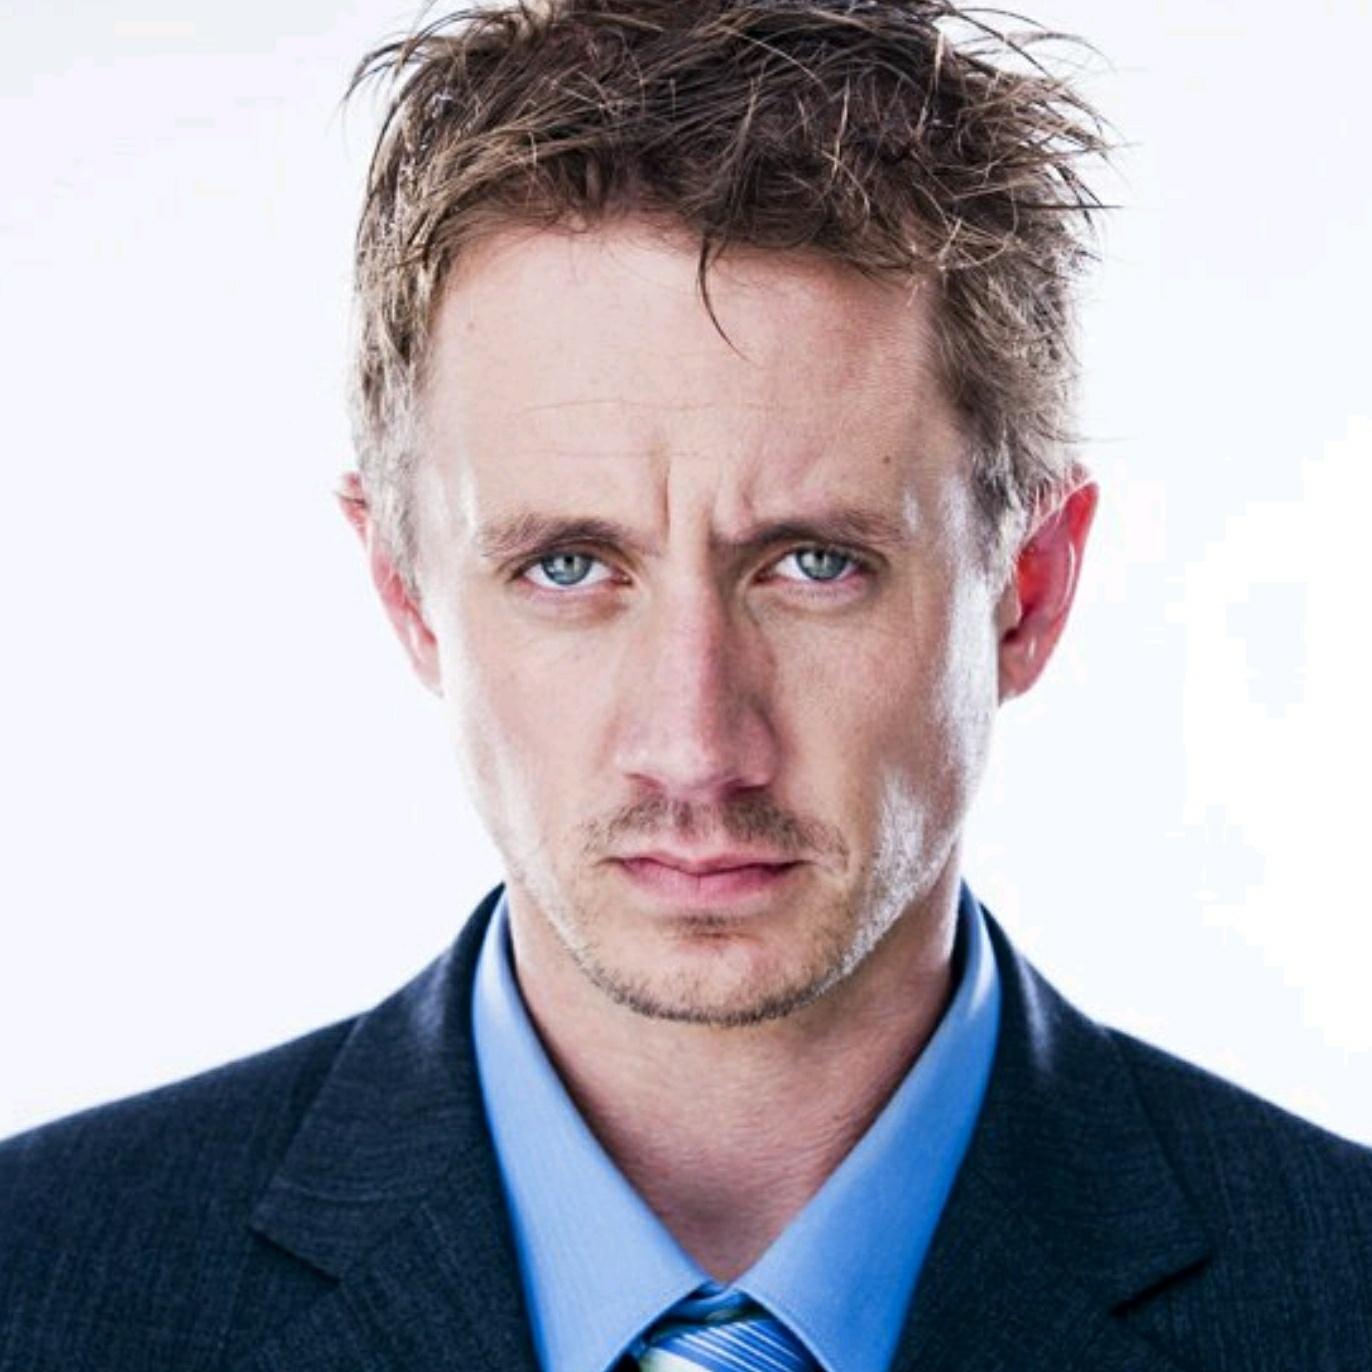 Avatar of Chad Lindberg